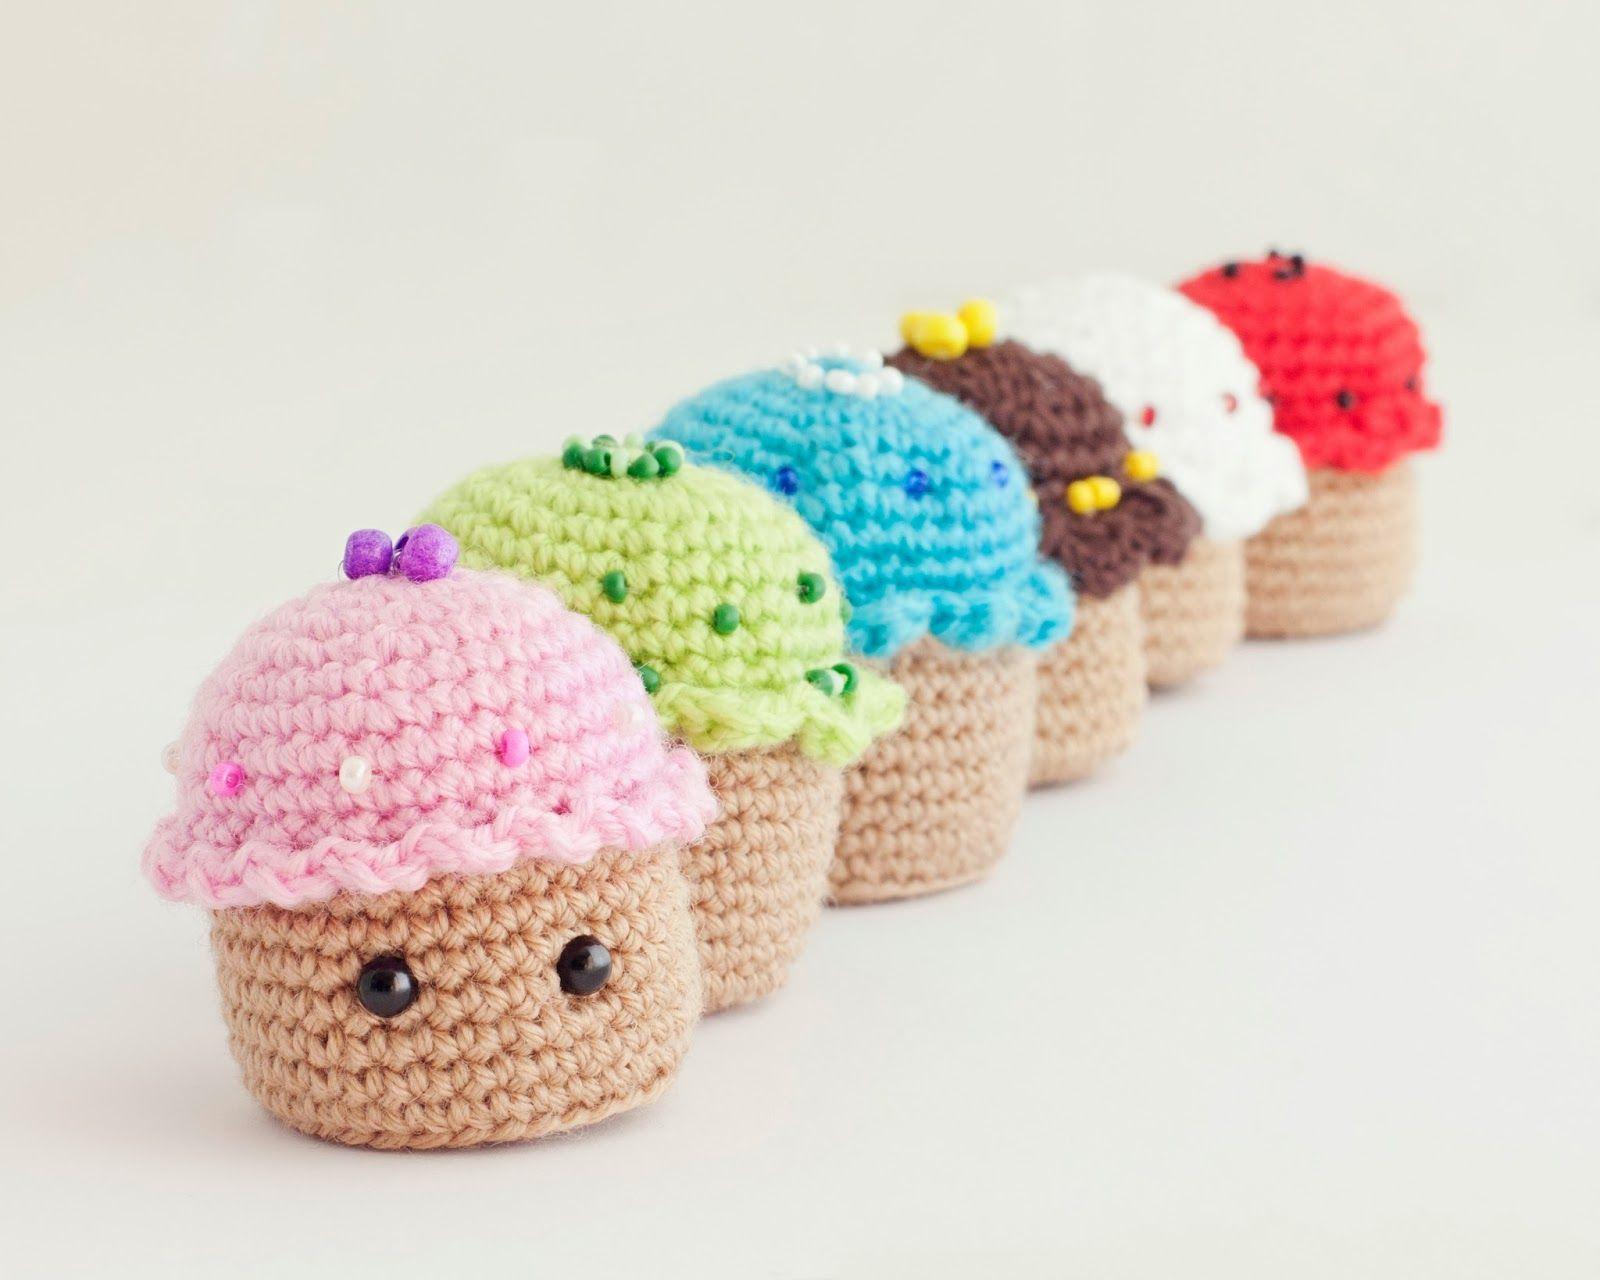 Amigurumi cupcake free crochet pattern tutorial crochet toys amigurumi cupcake free crochet pattern tutorial bankloansurffo Choice Image